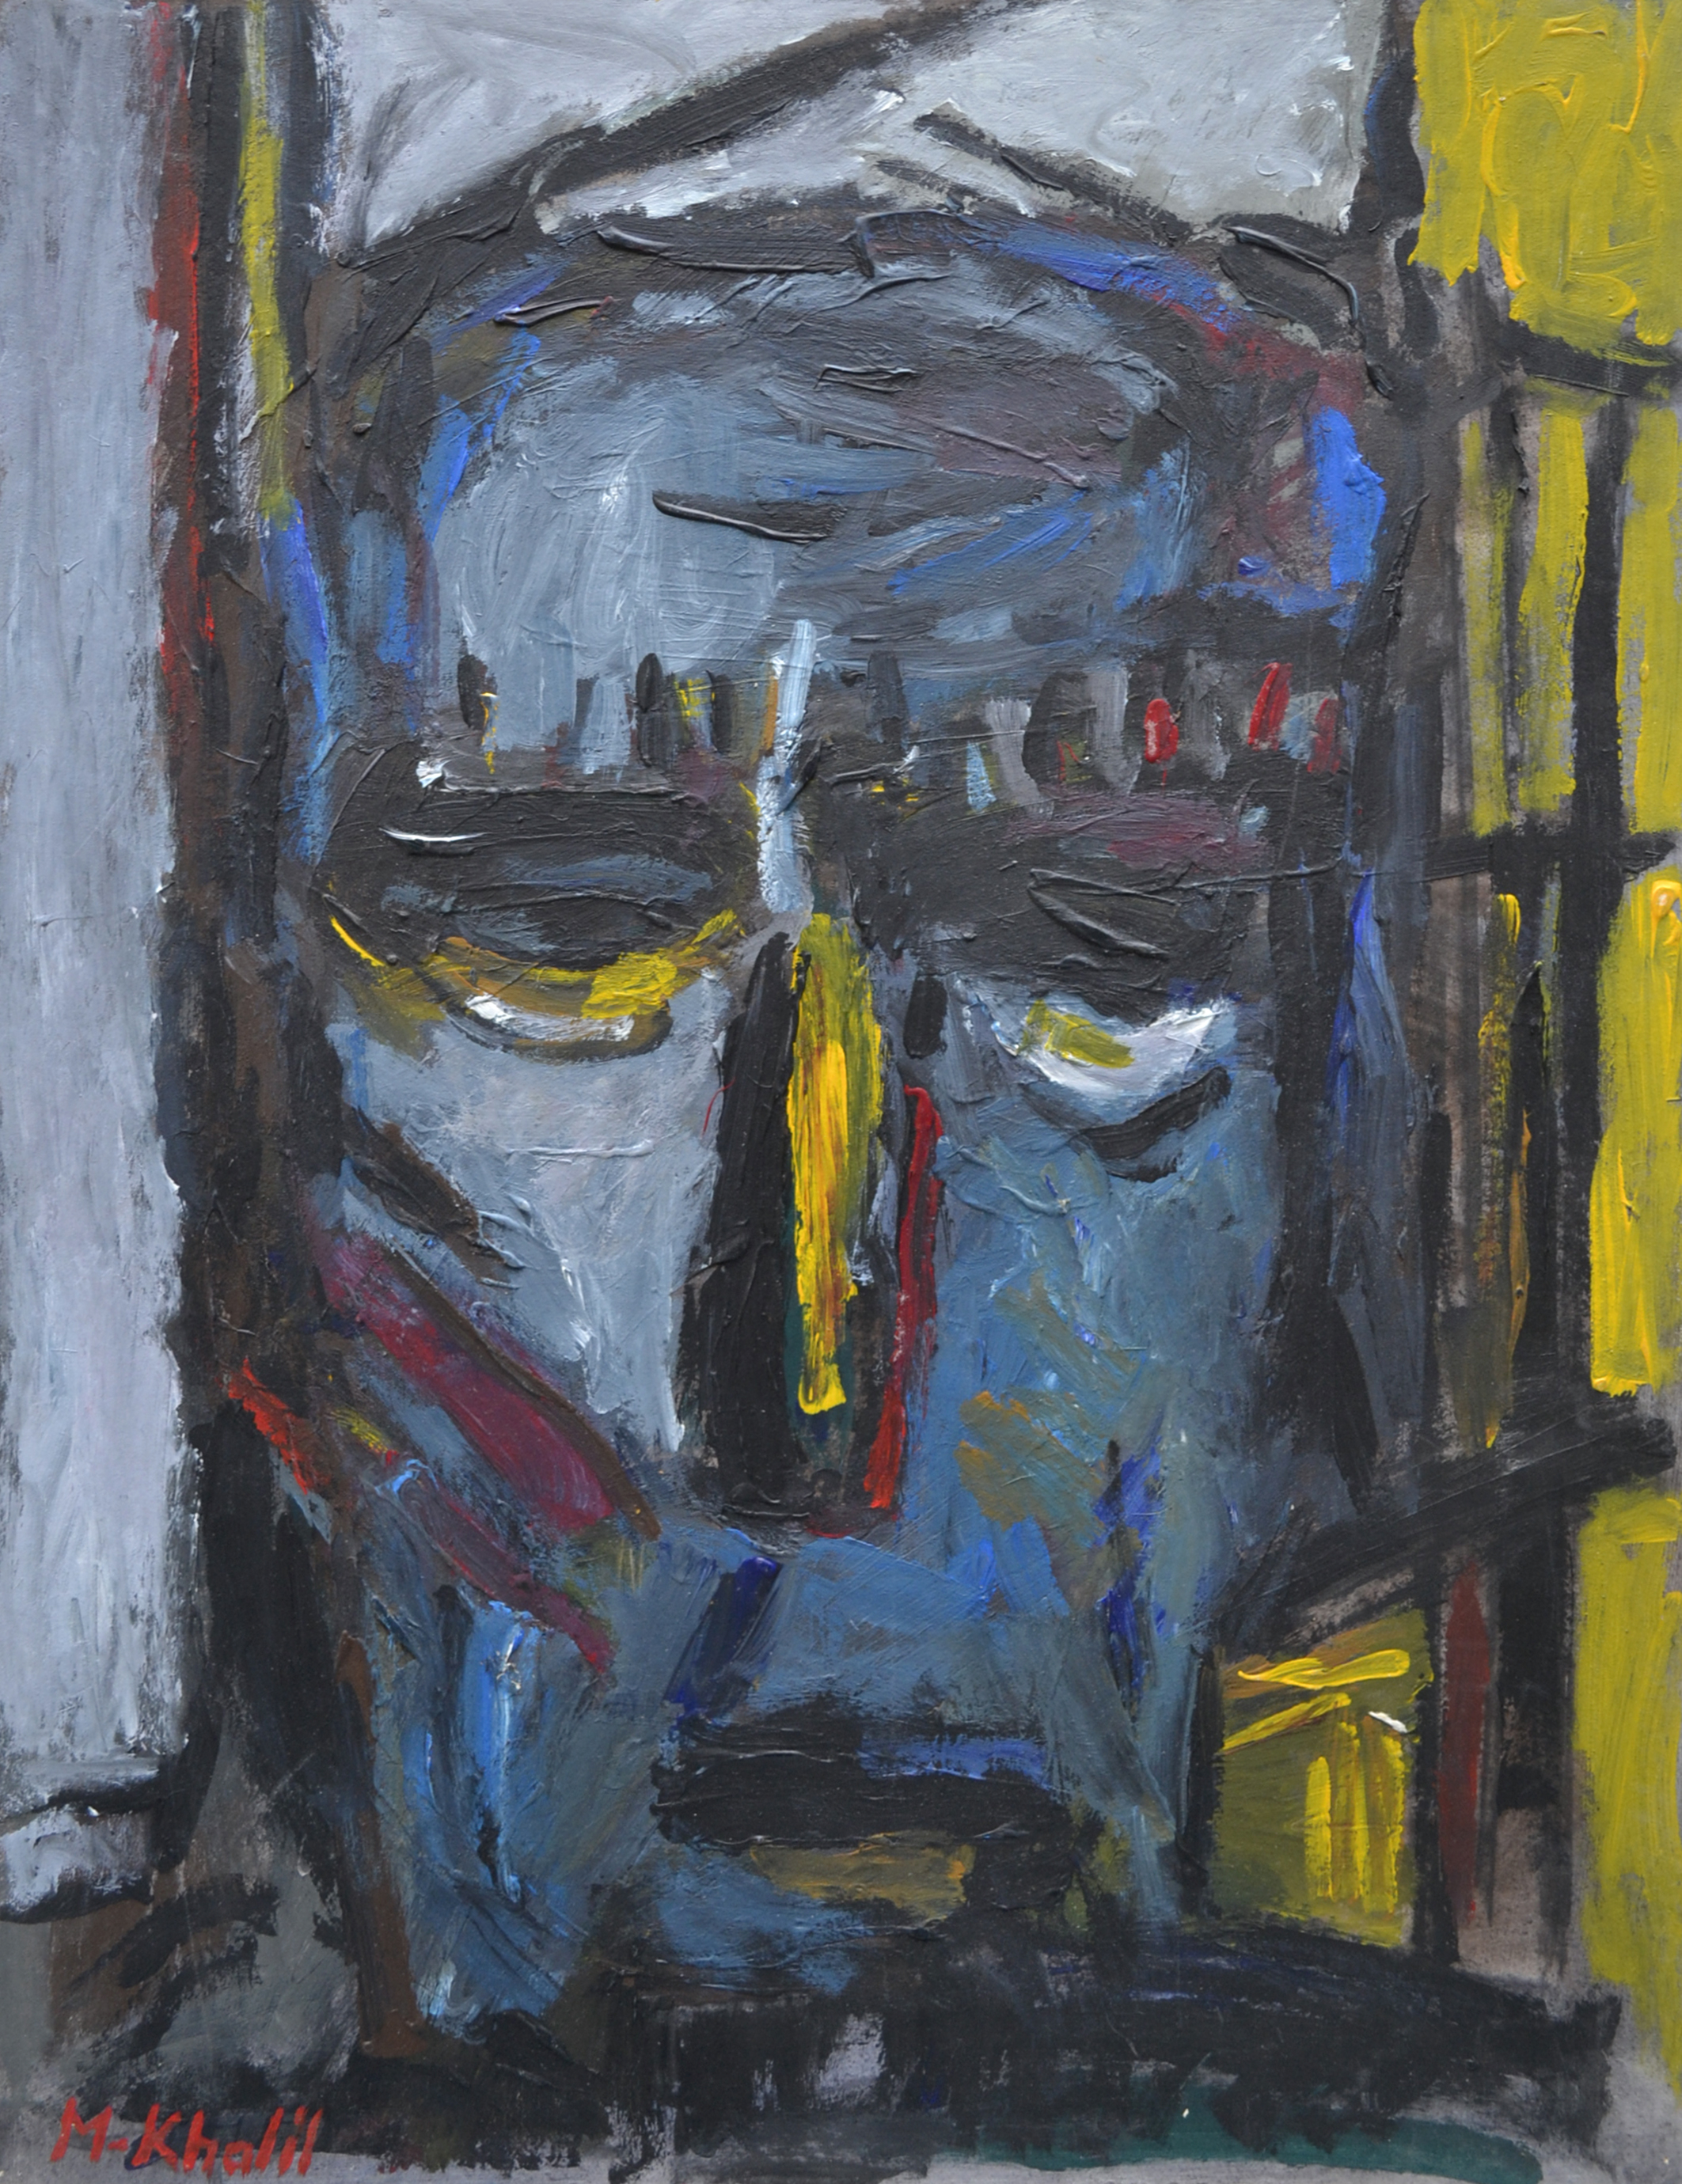 XOL Gallery - Mohamed Khalil (Palestine) - _Portrait_ - 20 x26 in - Acrylic on cardboard - $1,500.00.jpg